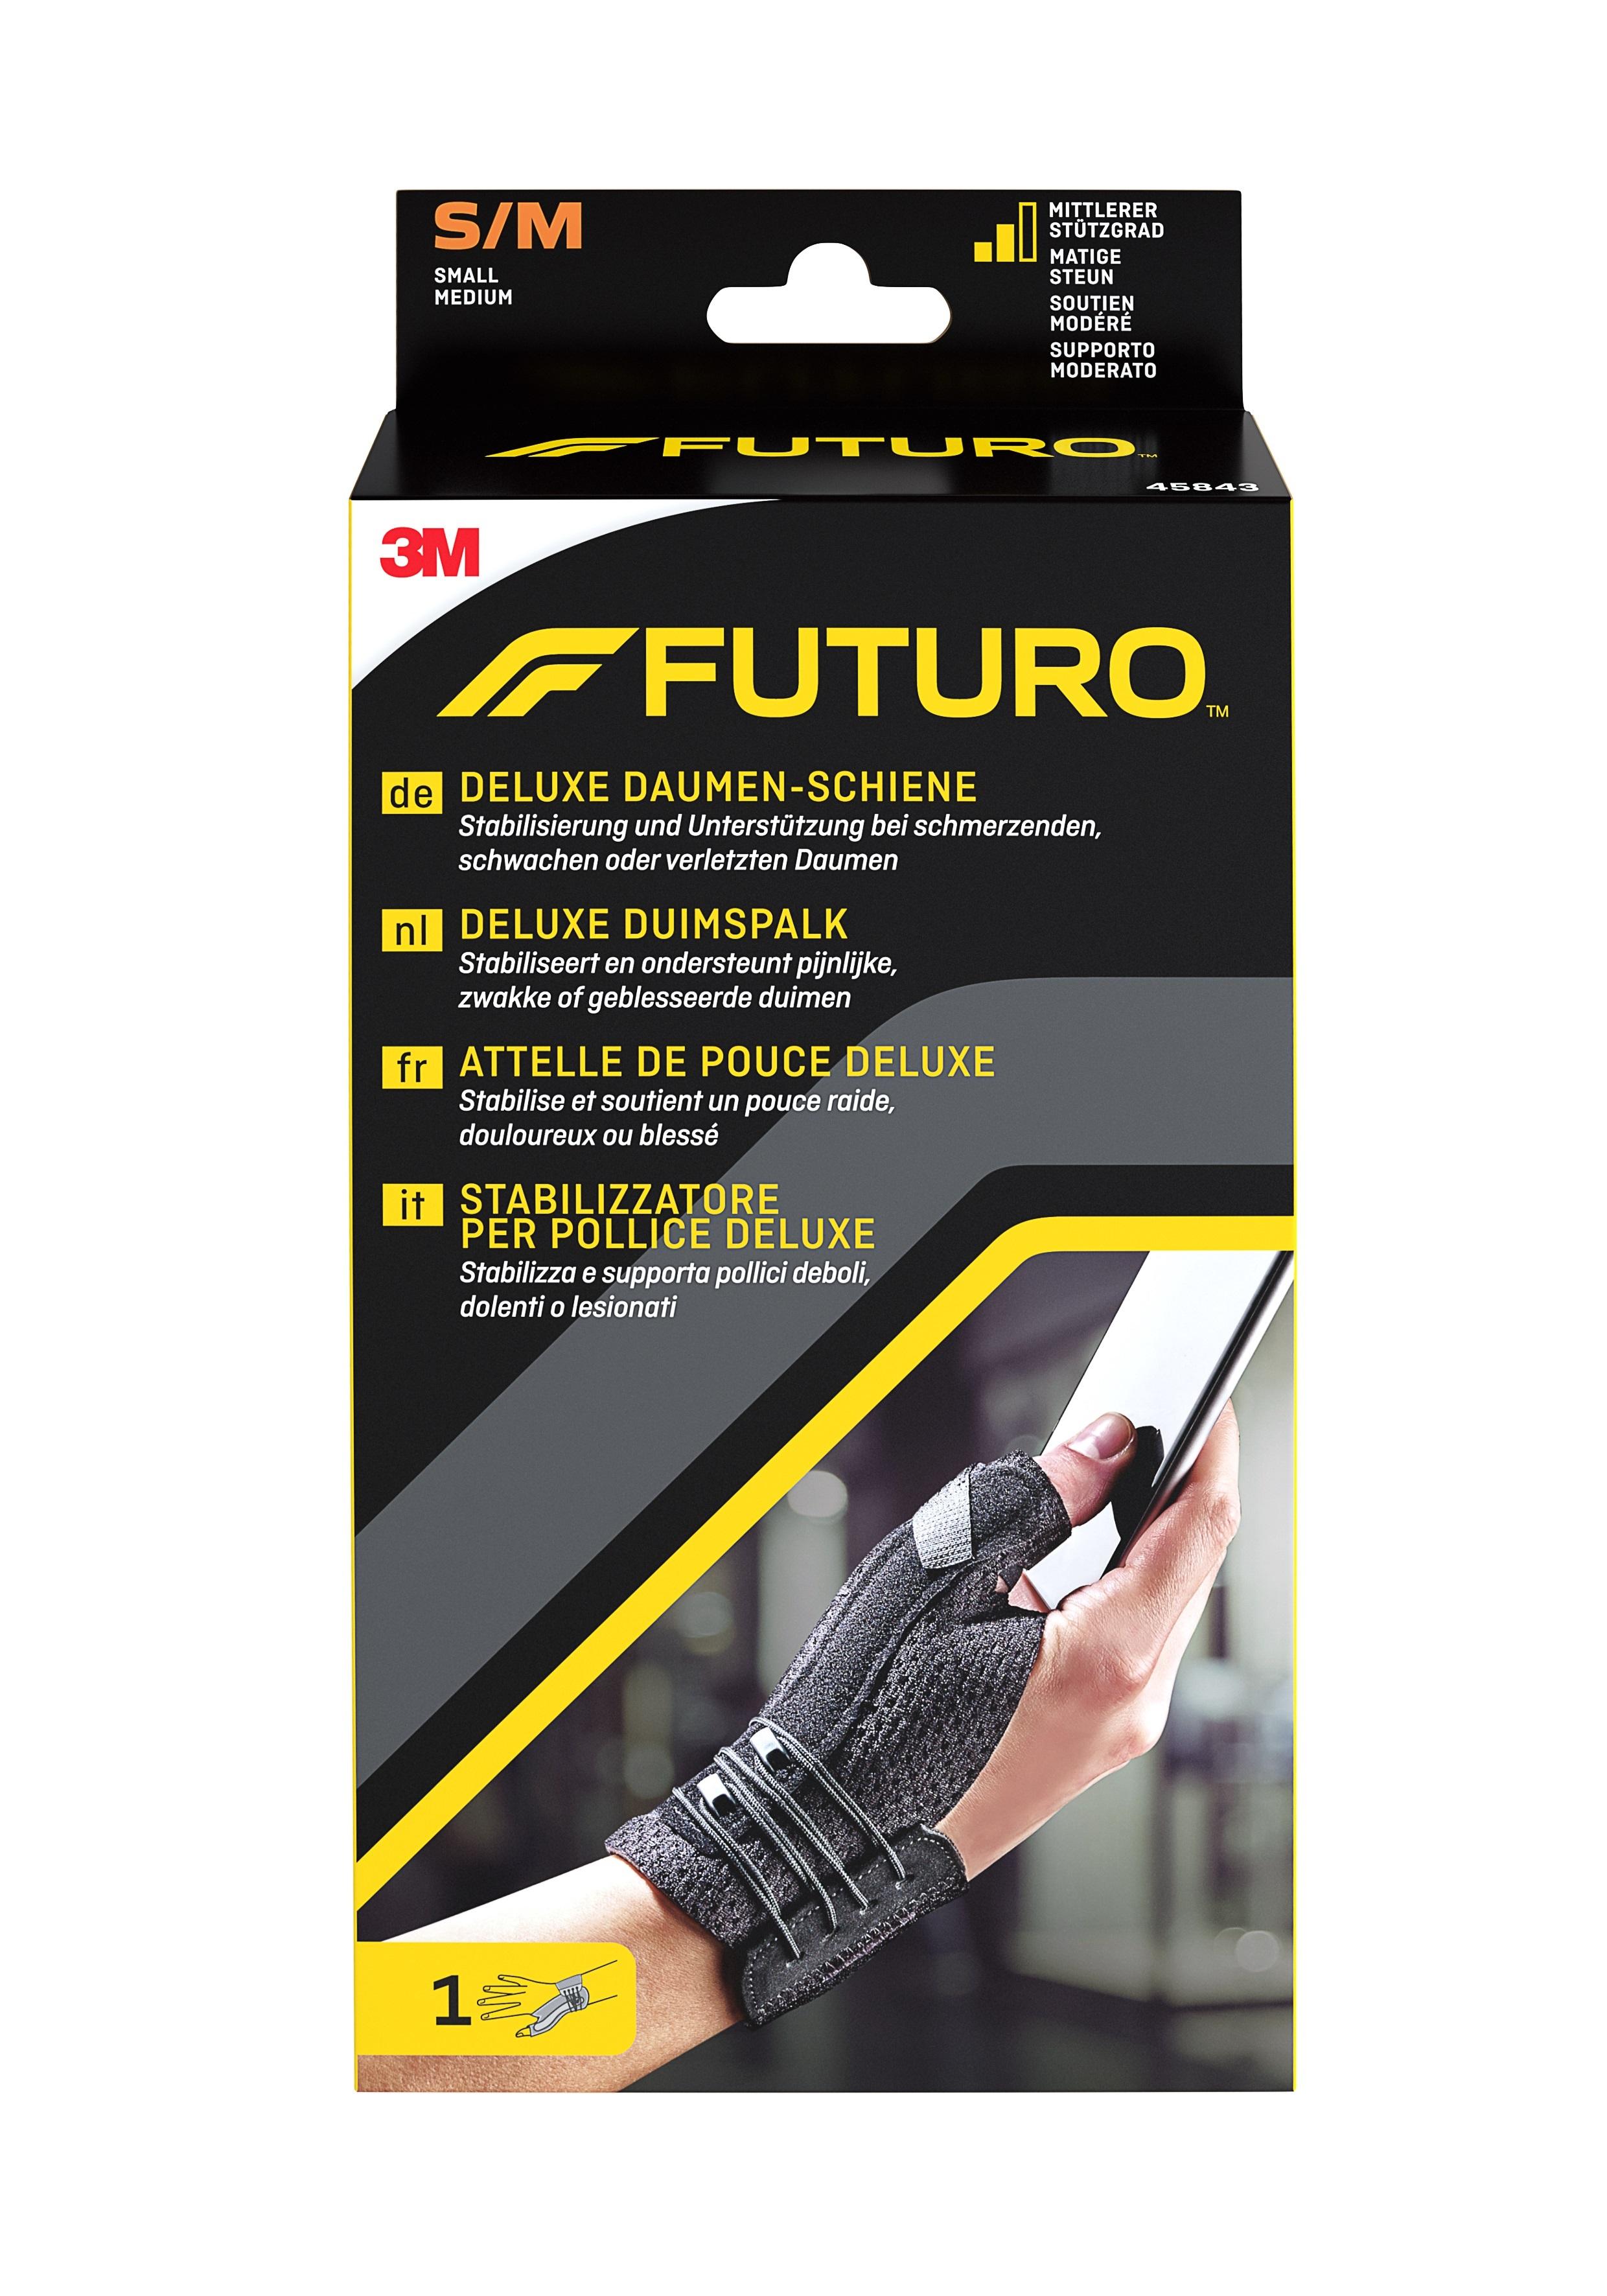 FUTURO™ Deluxe Daumen-Schiene